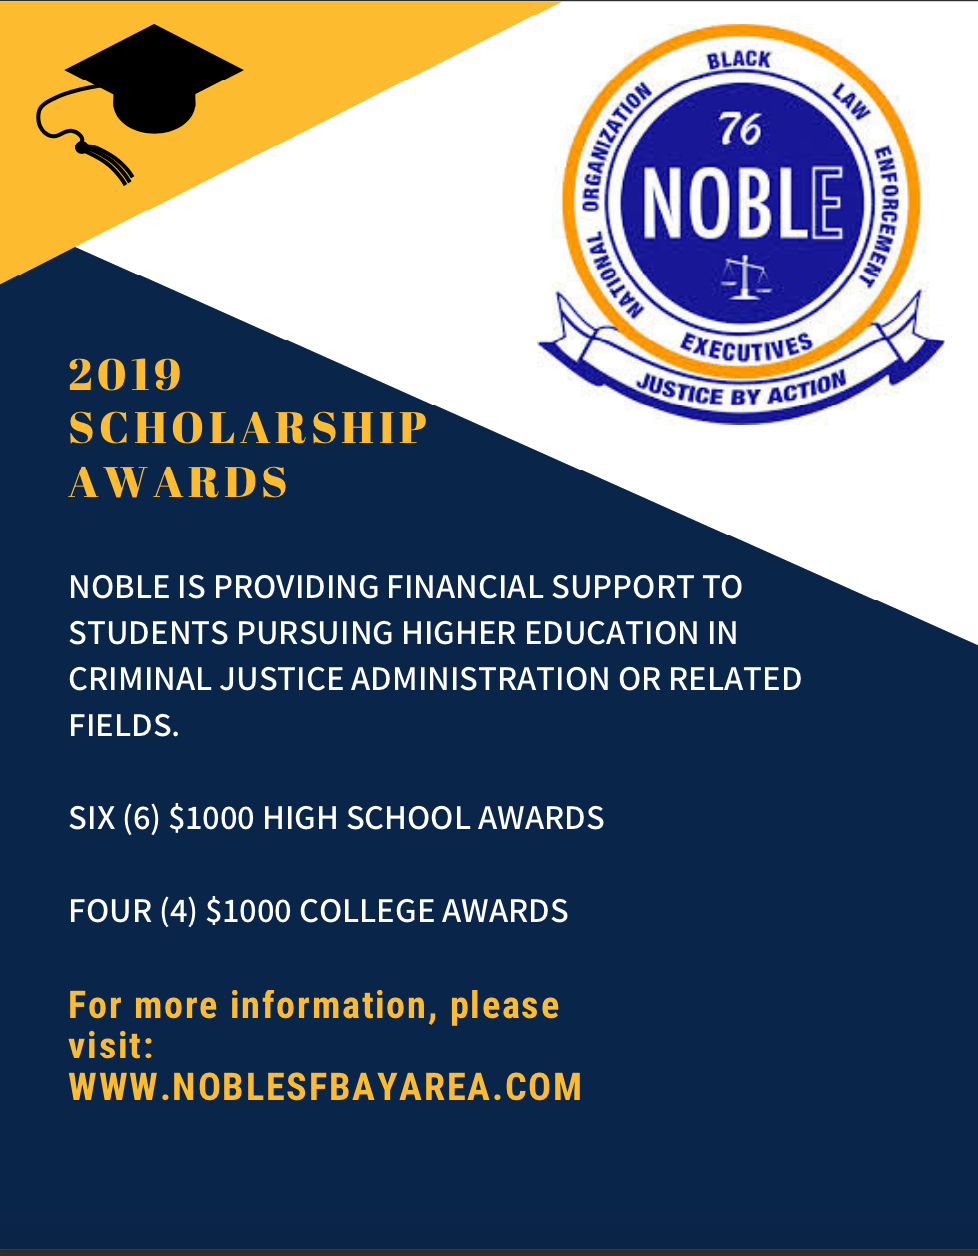 2019_Noble_Scholarship